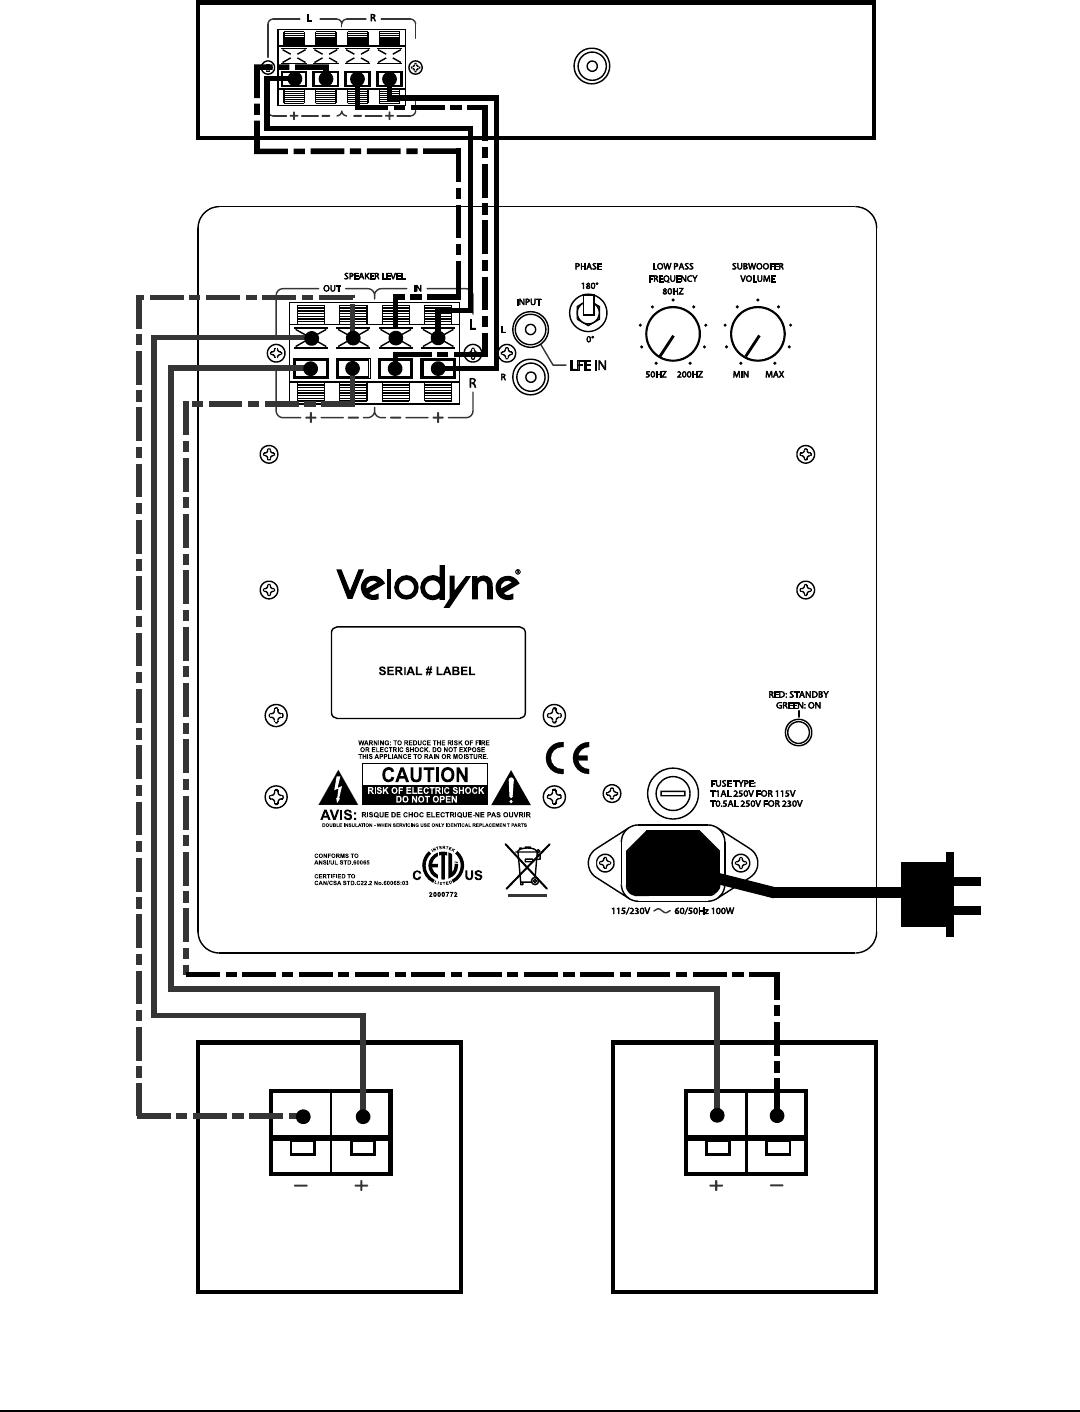 eclipse subwoofer wiring, rel subwoofer wiring, kenwood subwoofer wiring, surround sound subwoofer wiring, jl audio subwoofer wiring, kicker subwoofer wiring, energy subwoofer wiring, dual subwoofer wiring, pyle subwoofer wiring, polk subwoofer wiring, jbl subwoofer wiring, powered subwoofer wiring, rockford fosgate subwoofer wiring, mtx subwoofer wiring, infinity subwoofer wiring, bose subwoofer wiring, pioneer subwoofer wiring, sony subwoofer wiring, on velodyne subwoofer wiring diagram